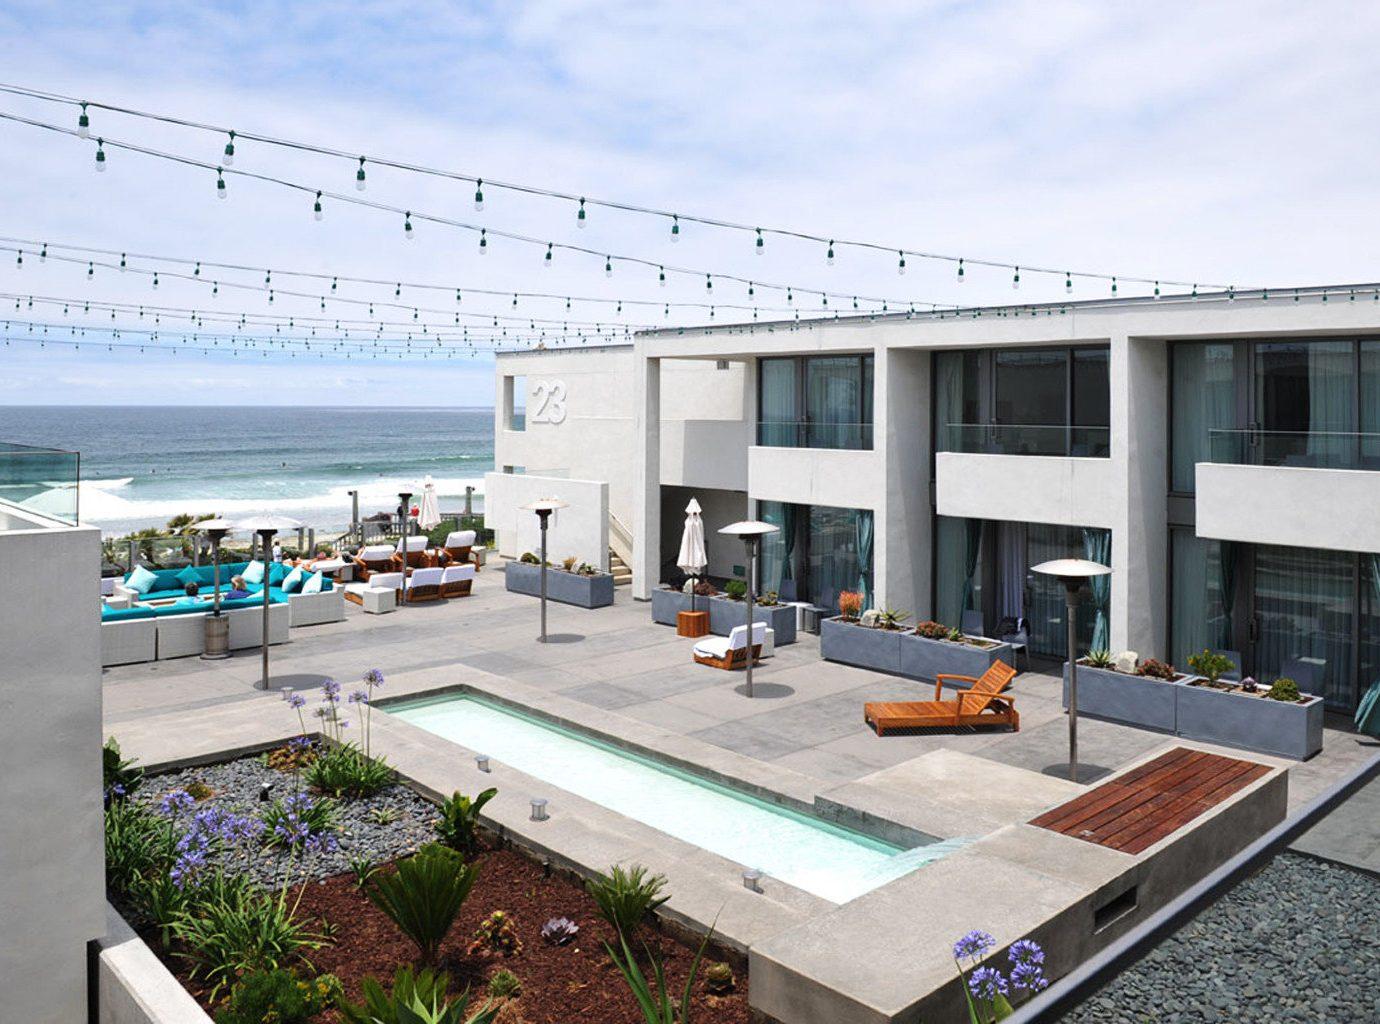 Architecture Beachfront Buildings Exterior Hotels Lounge Pool Resort Scenic views sky property real estate condominium facade headquarters interior design Design